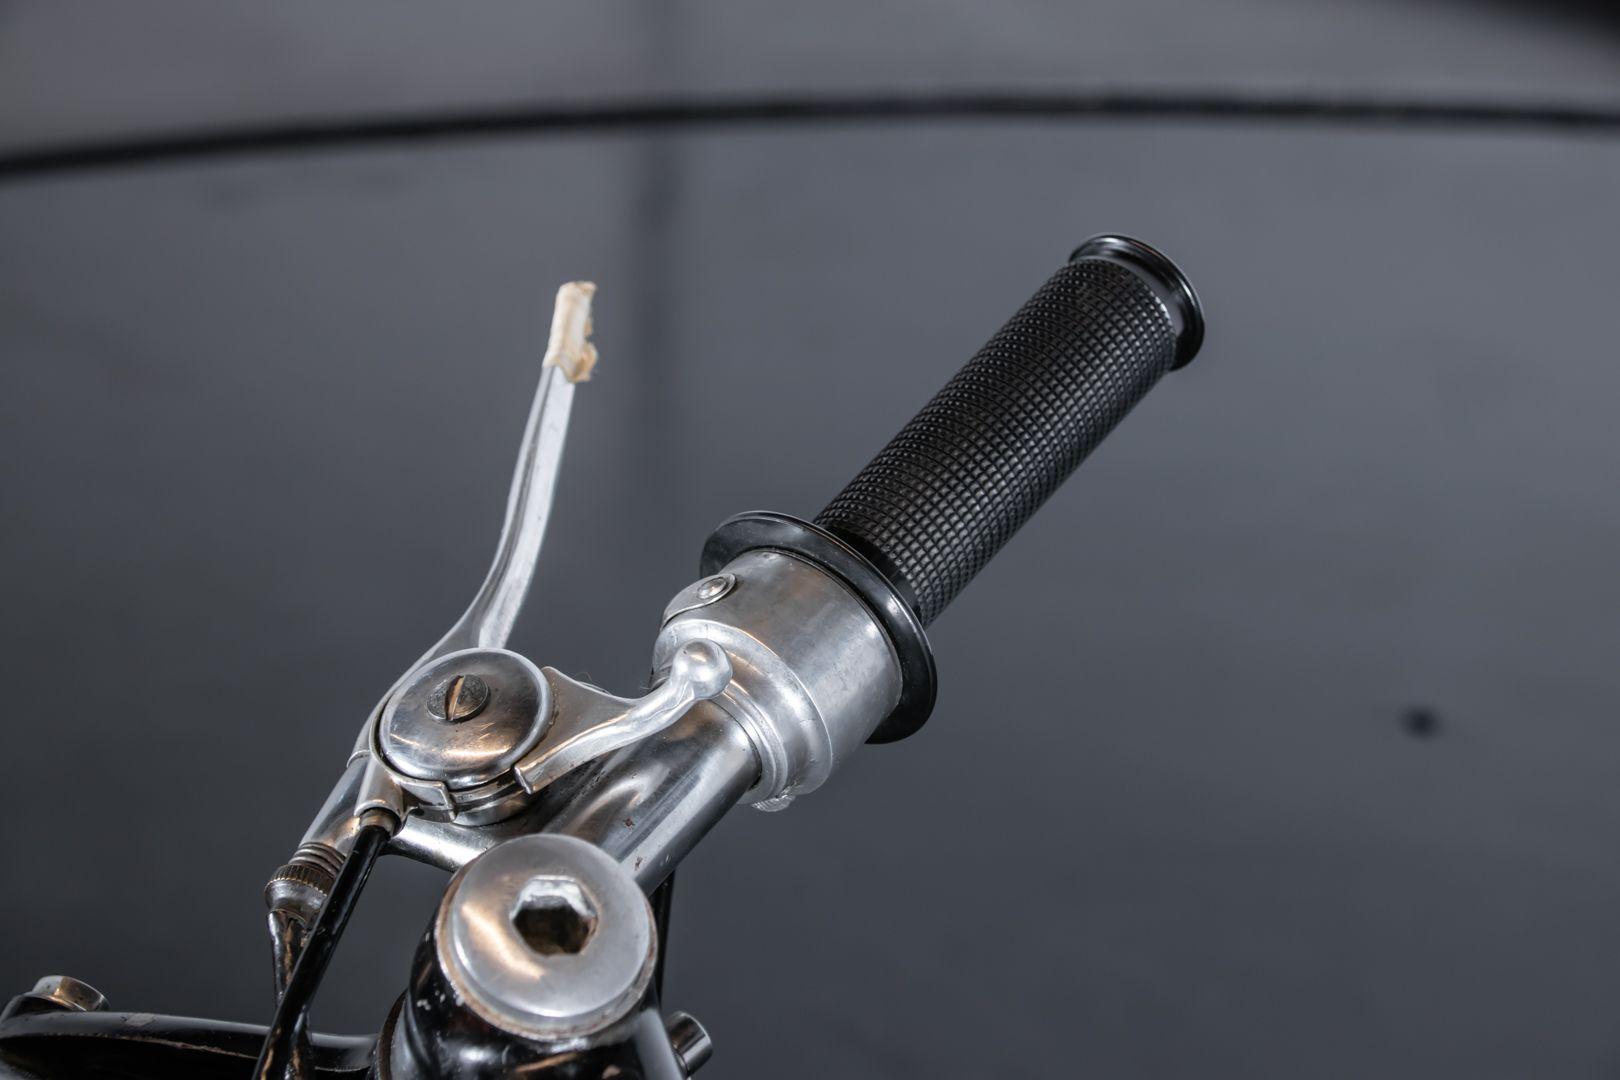 1960 Moto Morini Tresette Sprint 175 76480